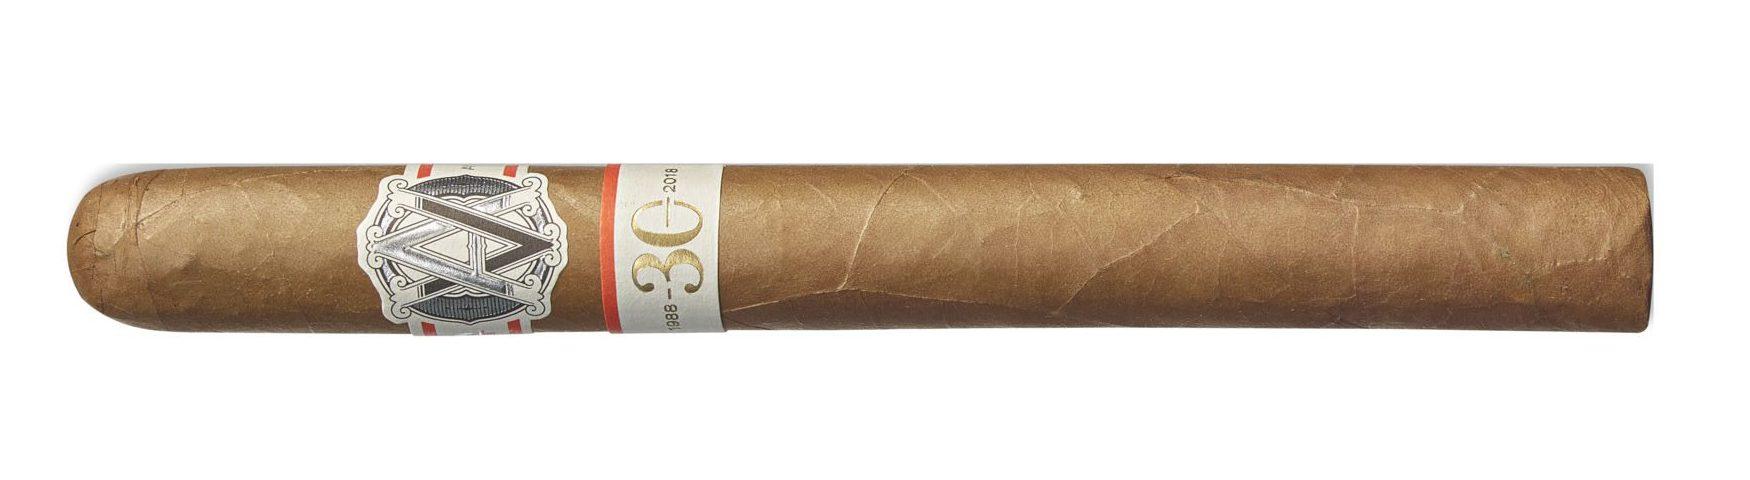 Cigar News: Davidoff Announces AVO Improvisation 30 Years